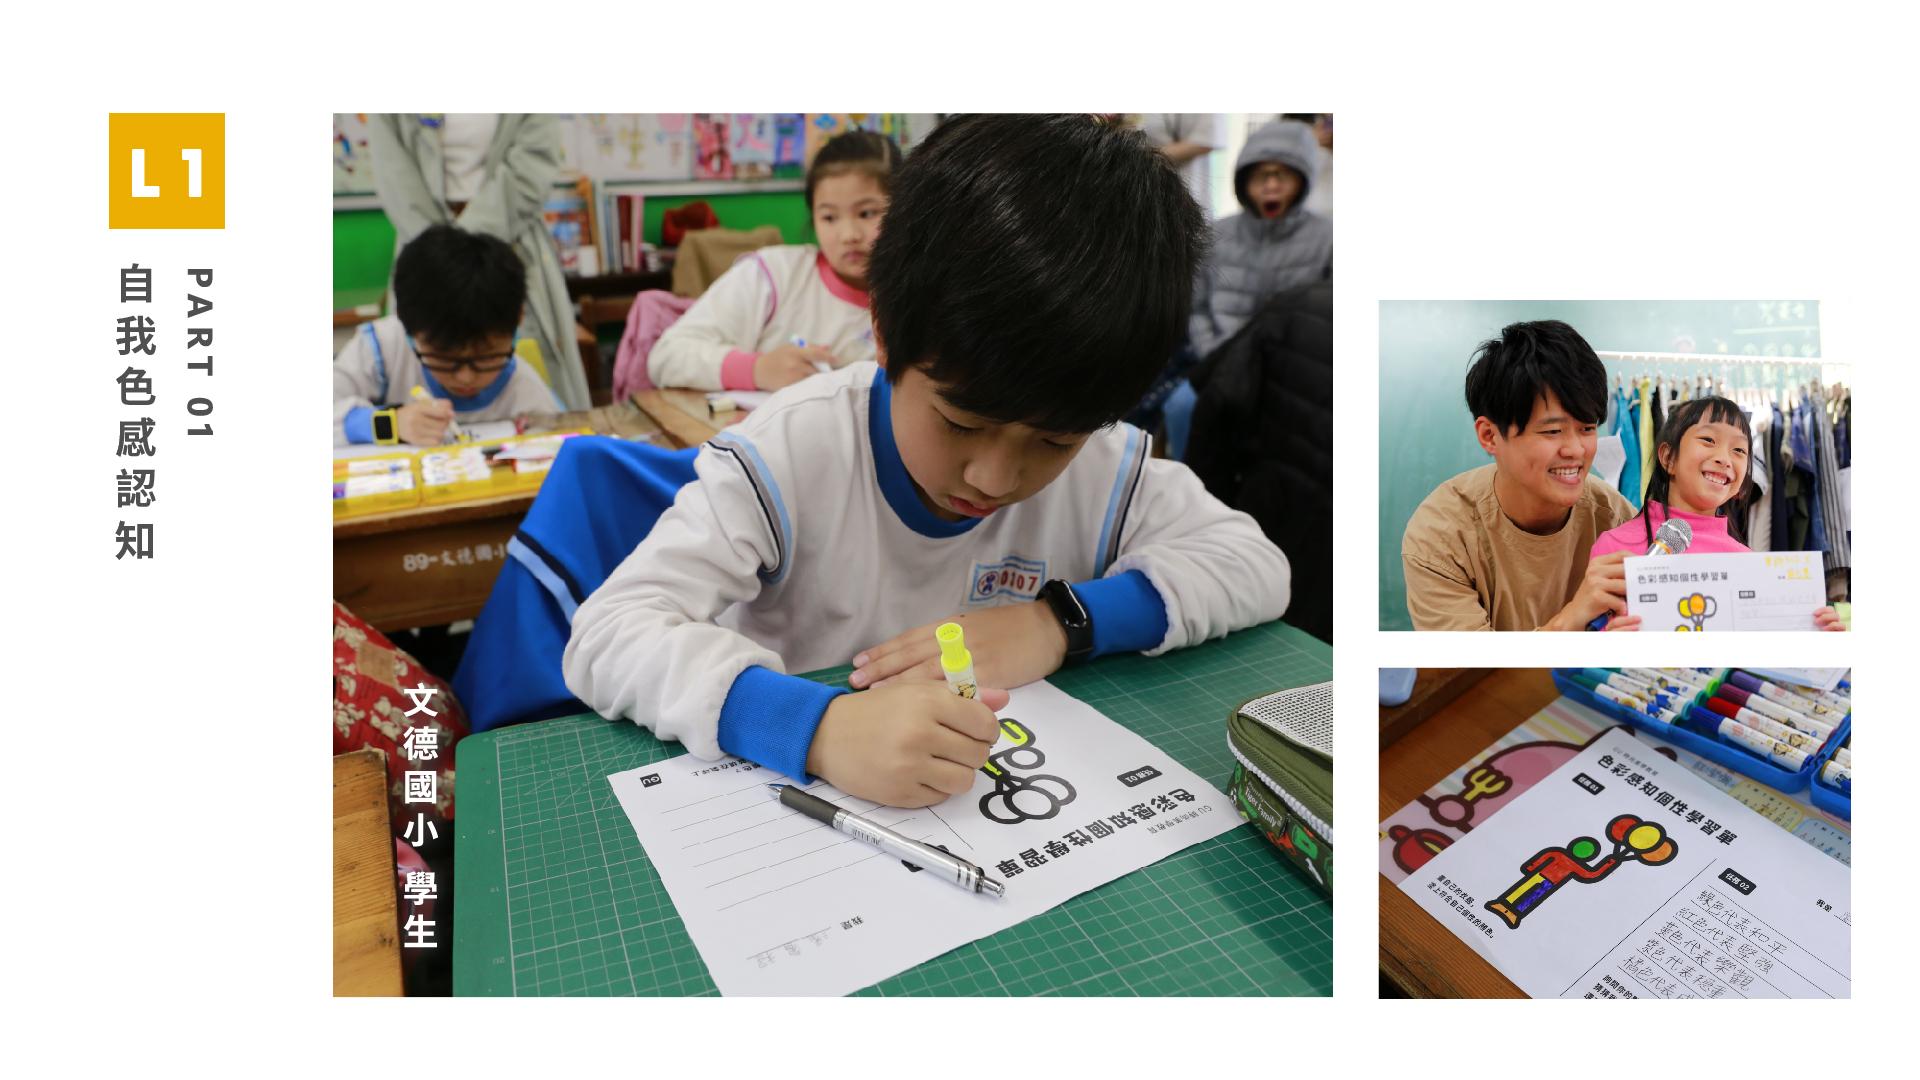 GU X 甘樂文創 Lesson 1:生活色彩風格穿搭教學班    課程設計方向以服飾穿搭作為基礎,初步發想朝向發展色彩學、布料辨識、穿搭禮儀等相關知識連結國小生活課程。 | 甘樂文創 | 甘之如飴,樂在其中